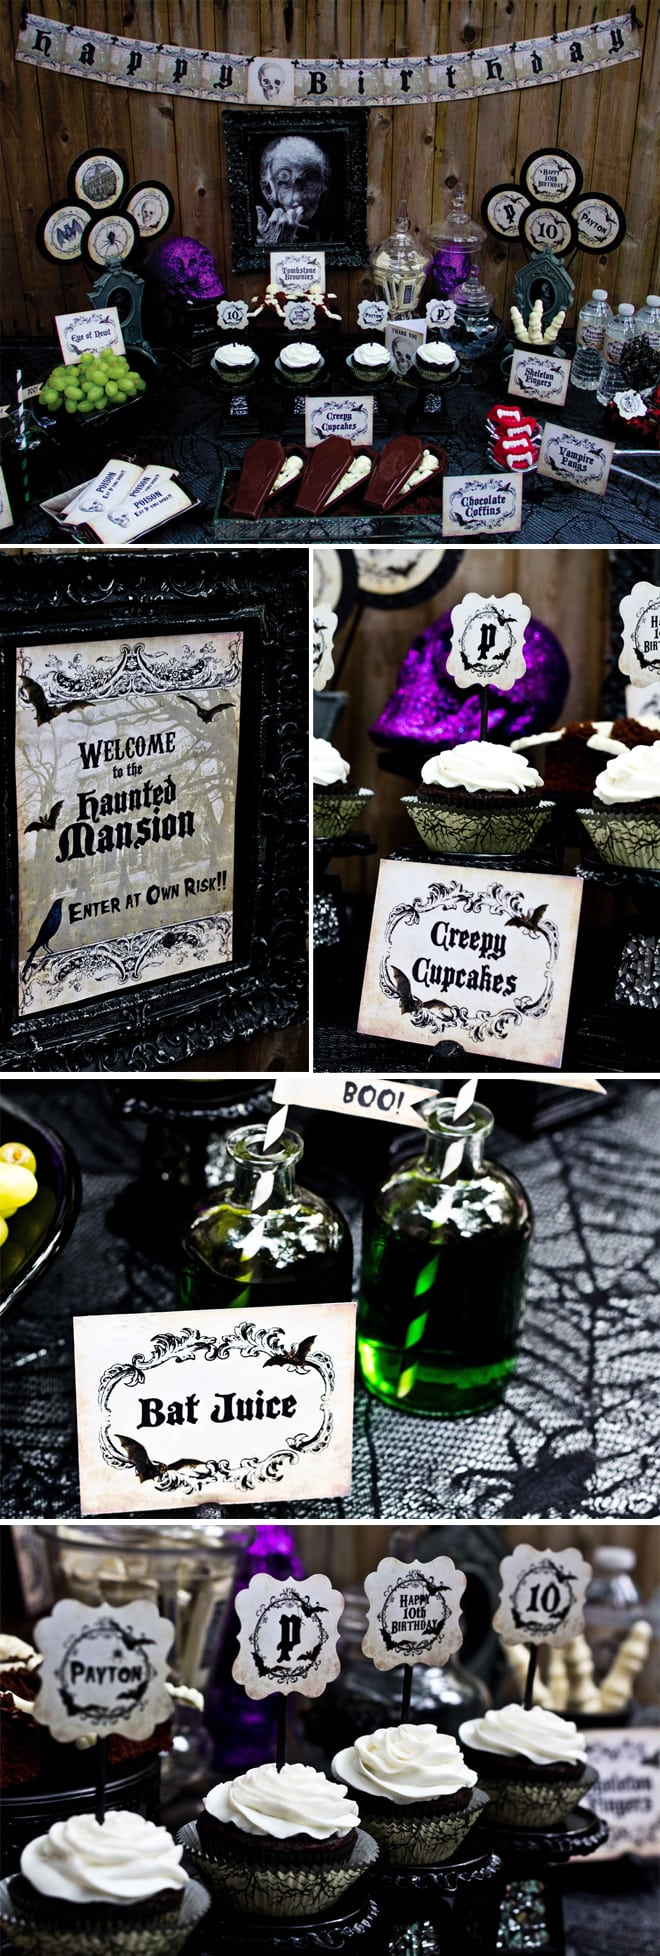 Cute Spooky Halloween Party